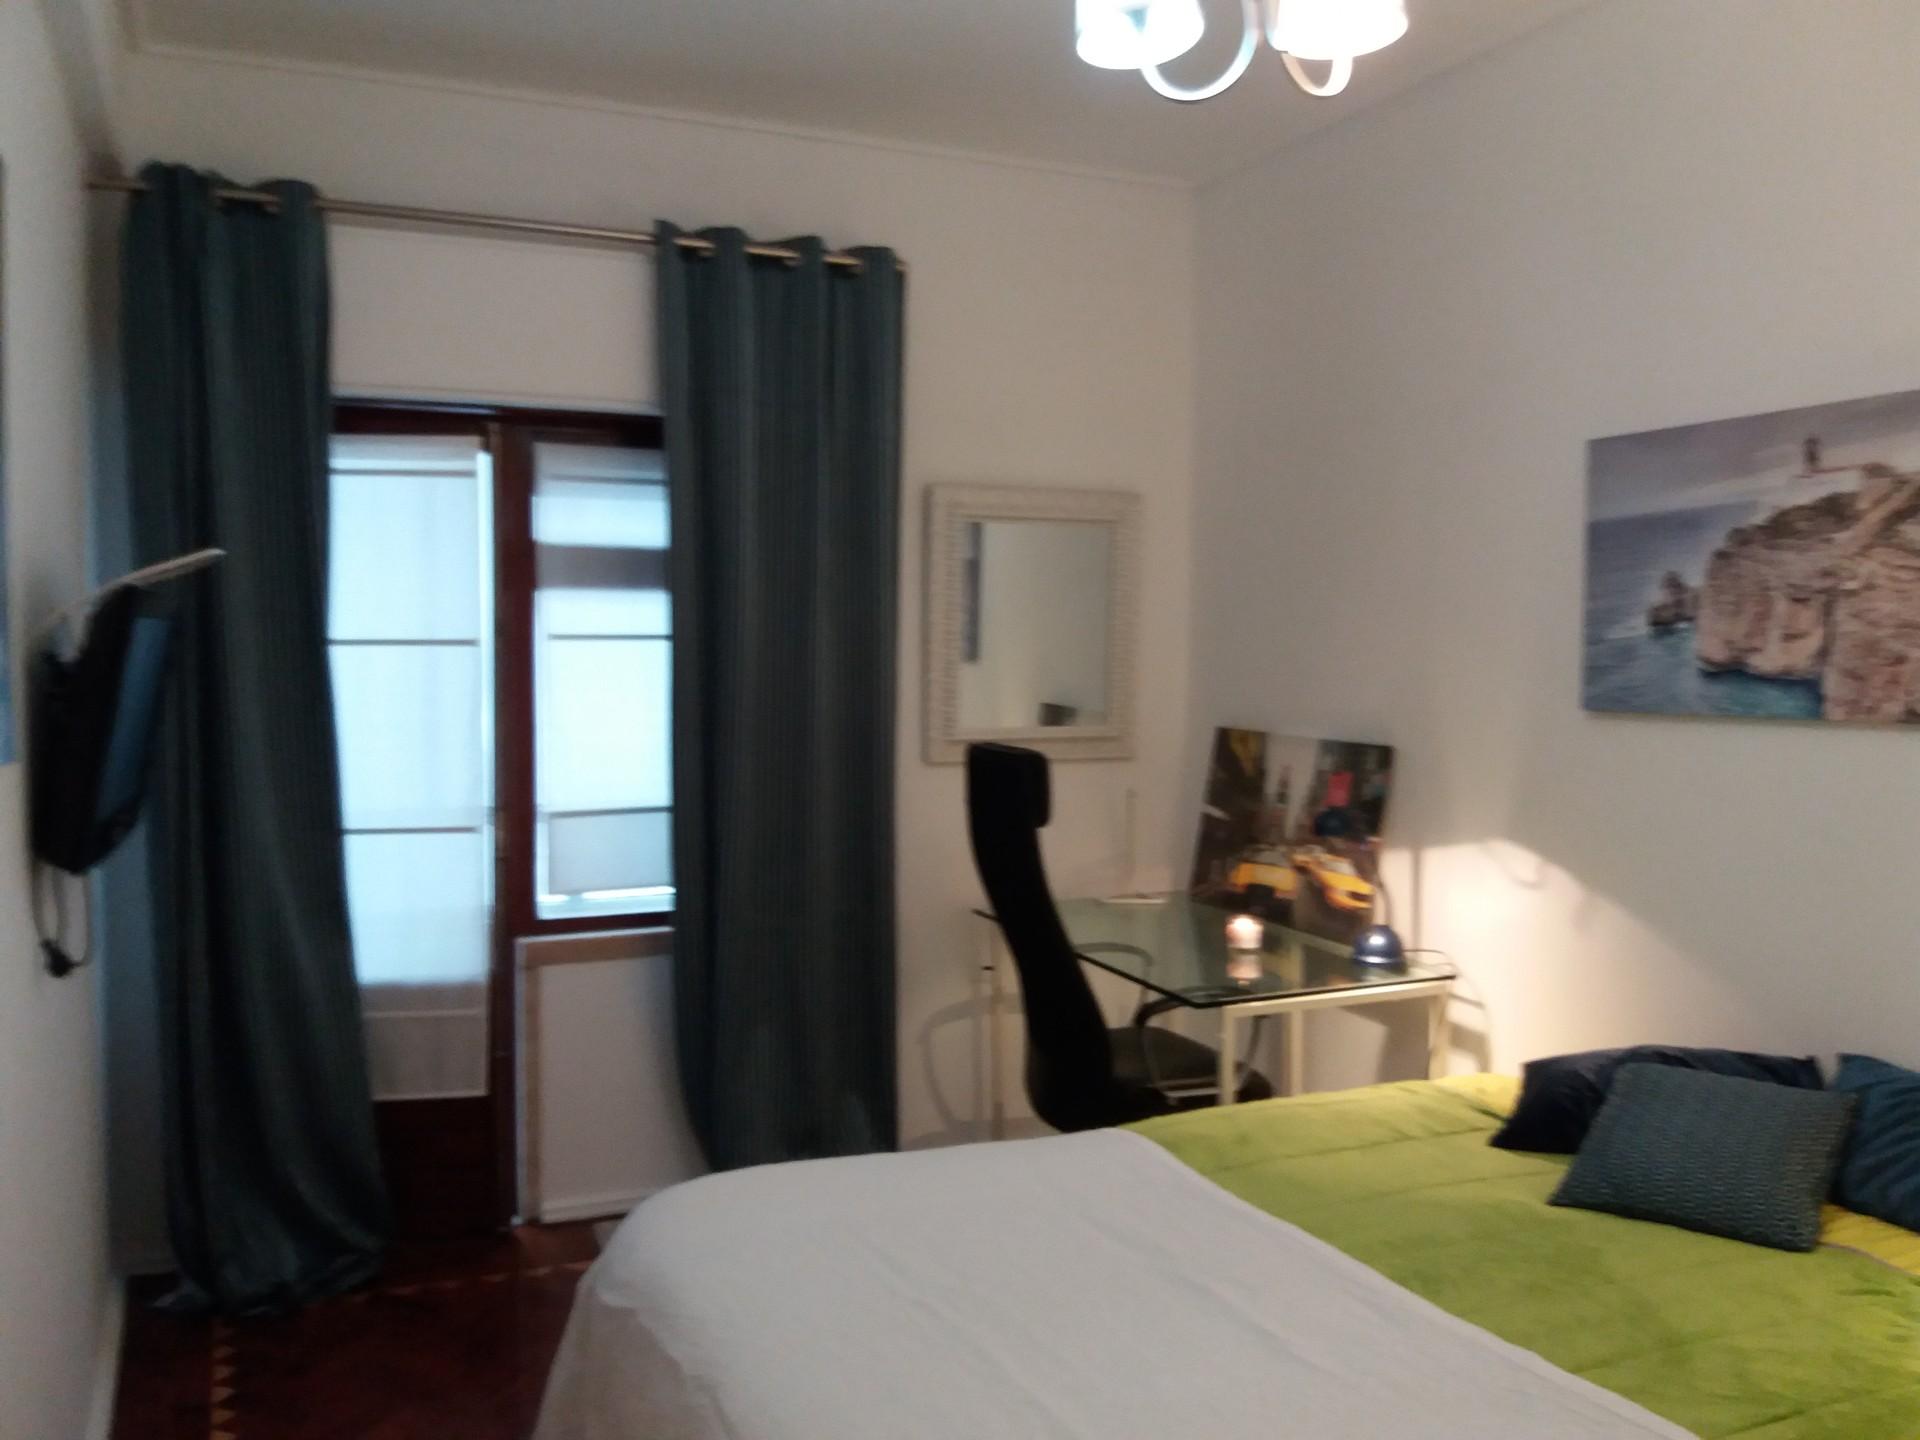 Sunny room, big apartment, three rooms, three girls